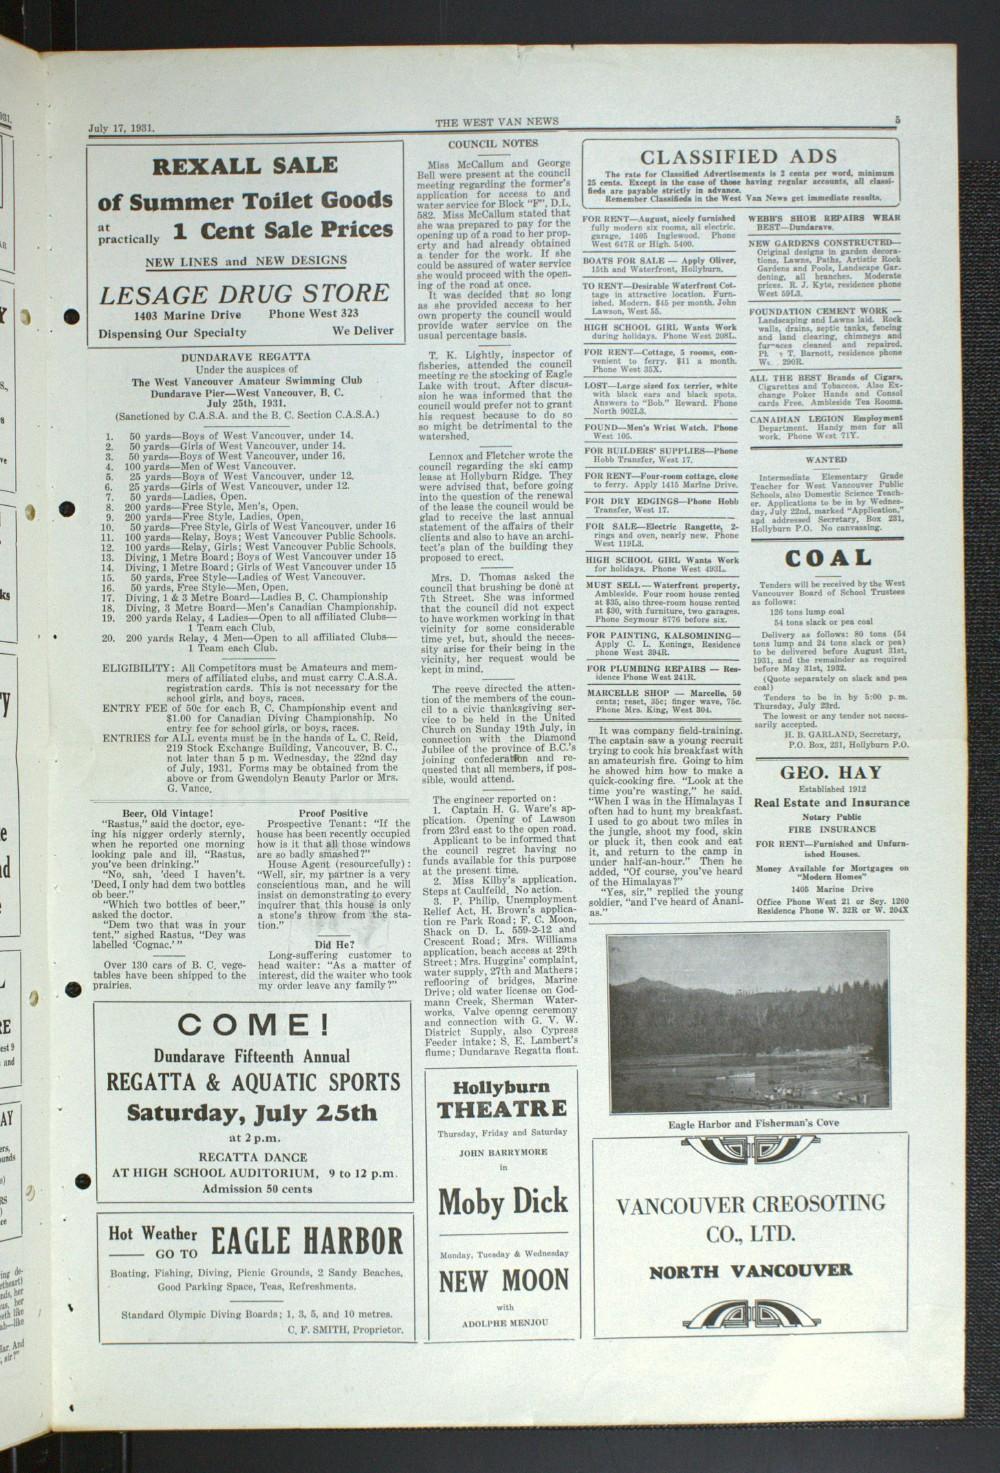 West Van. News (West Vancouver), 17 Jul 1931